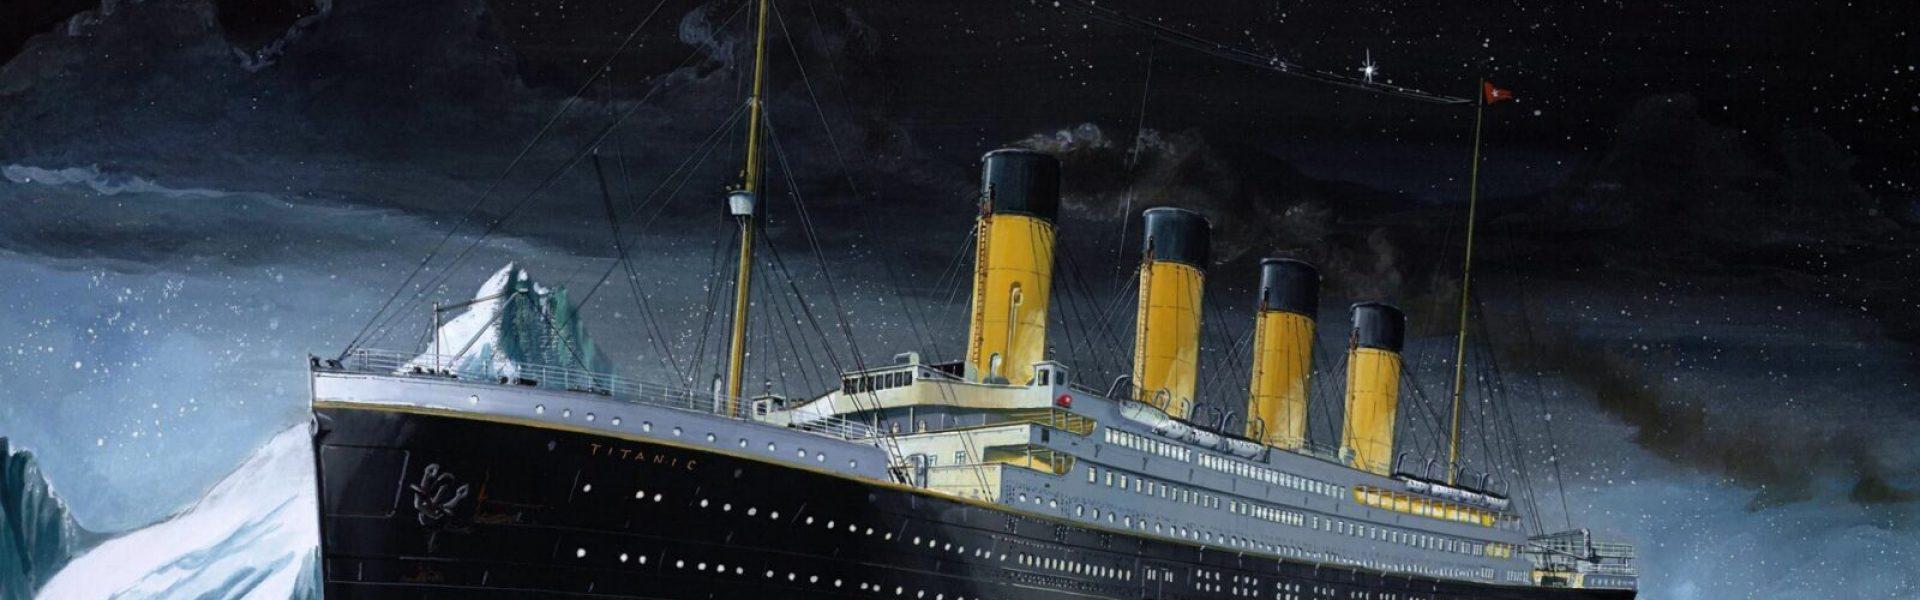 Titanic-affondato-